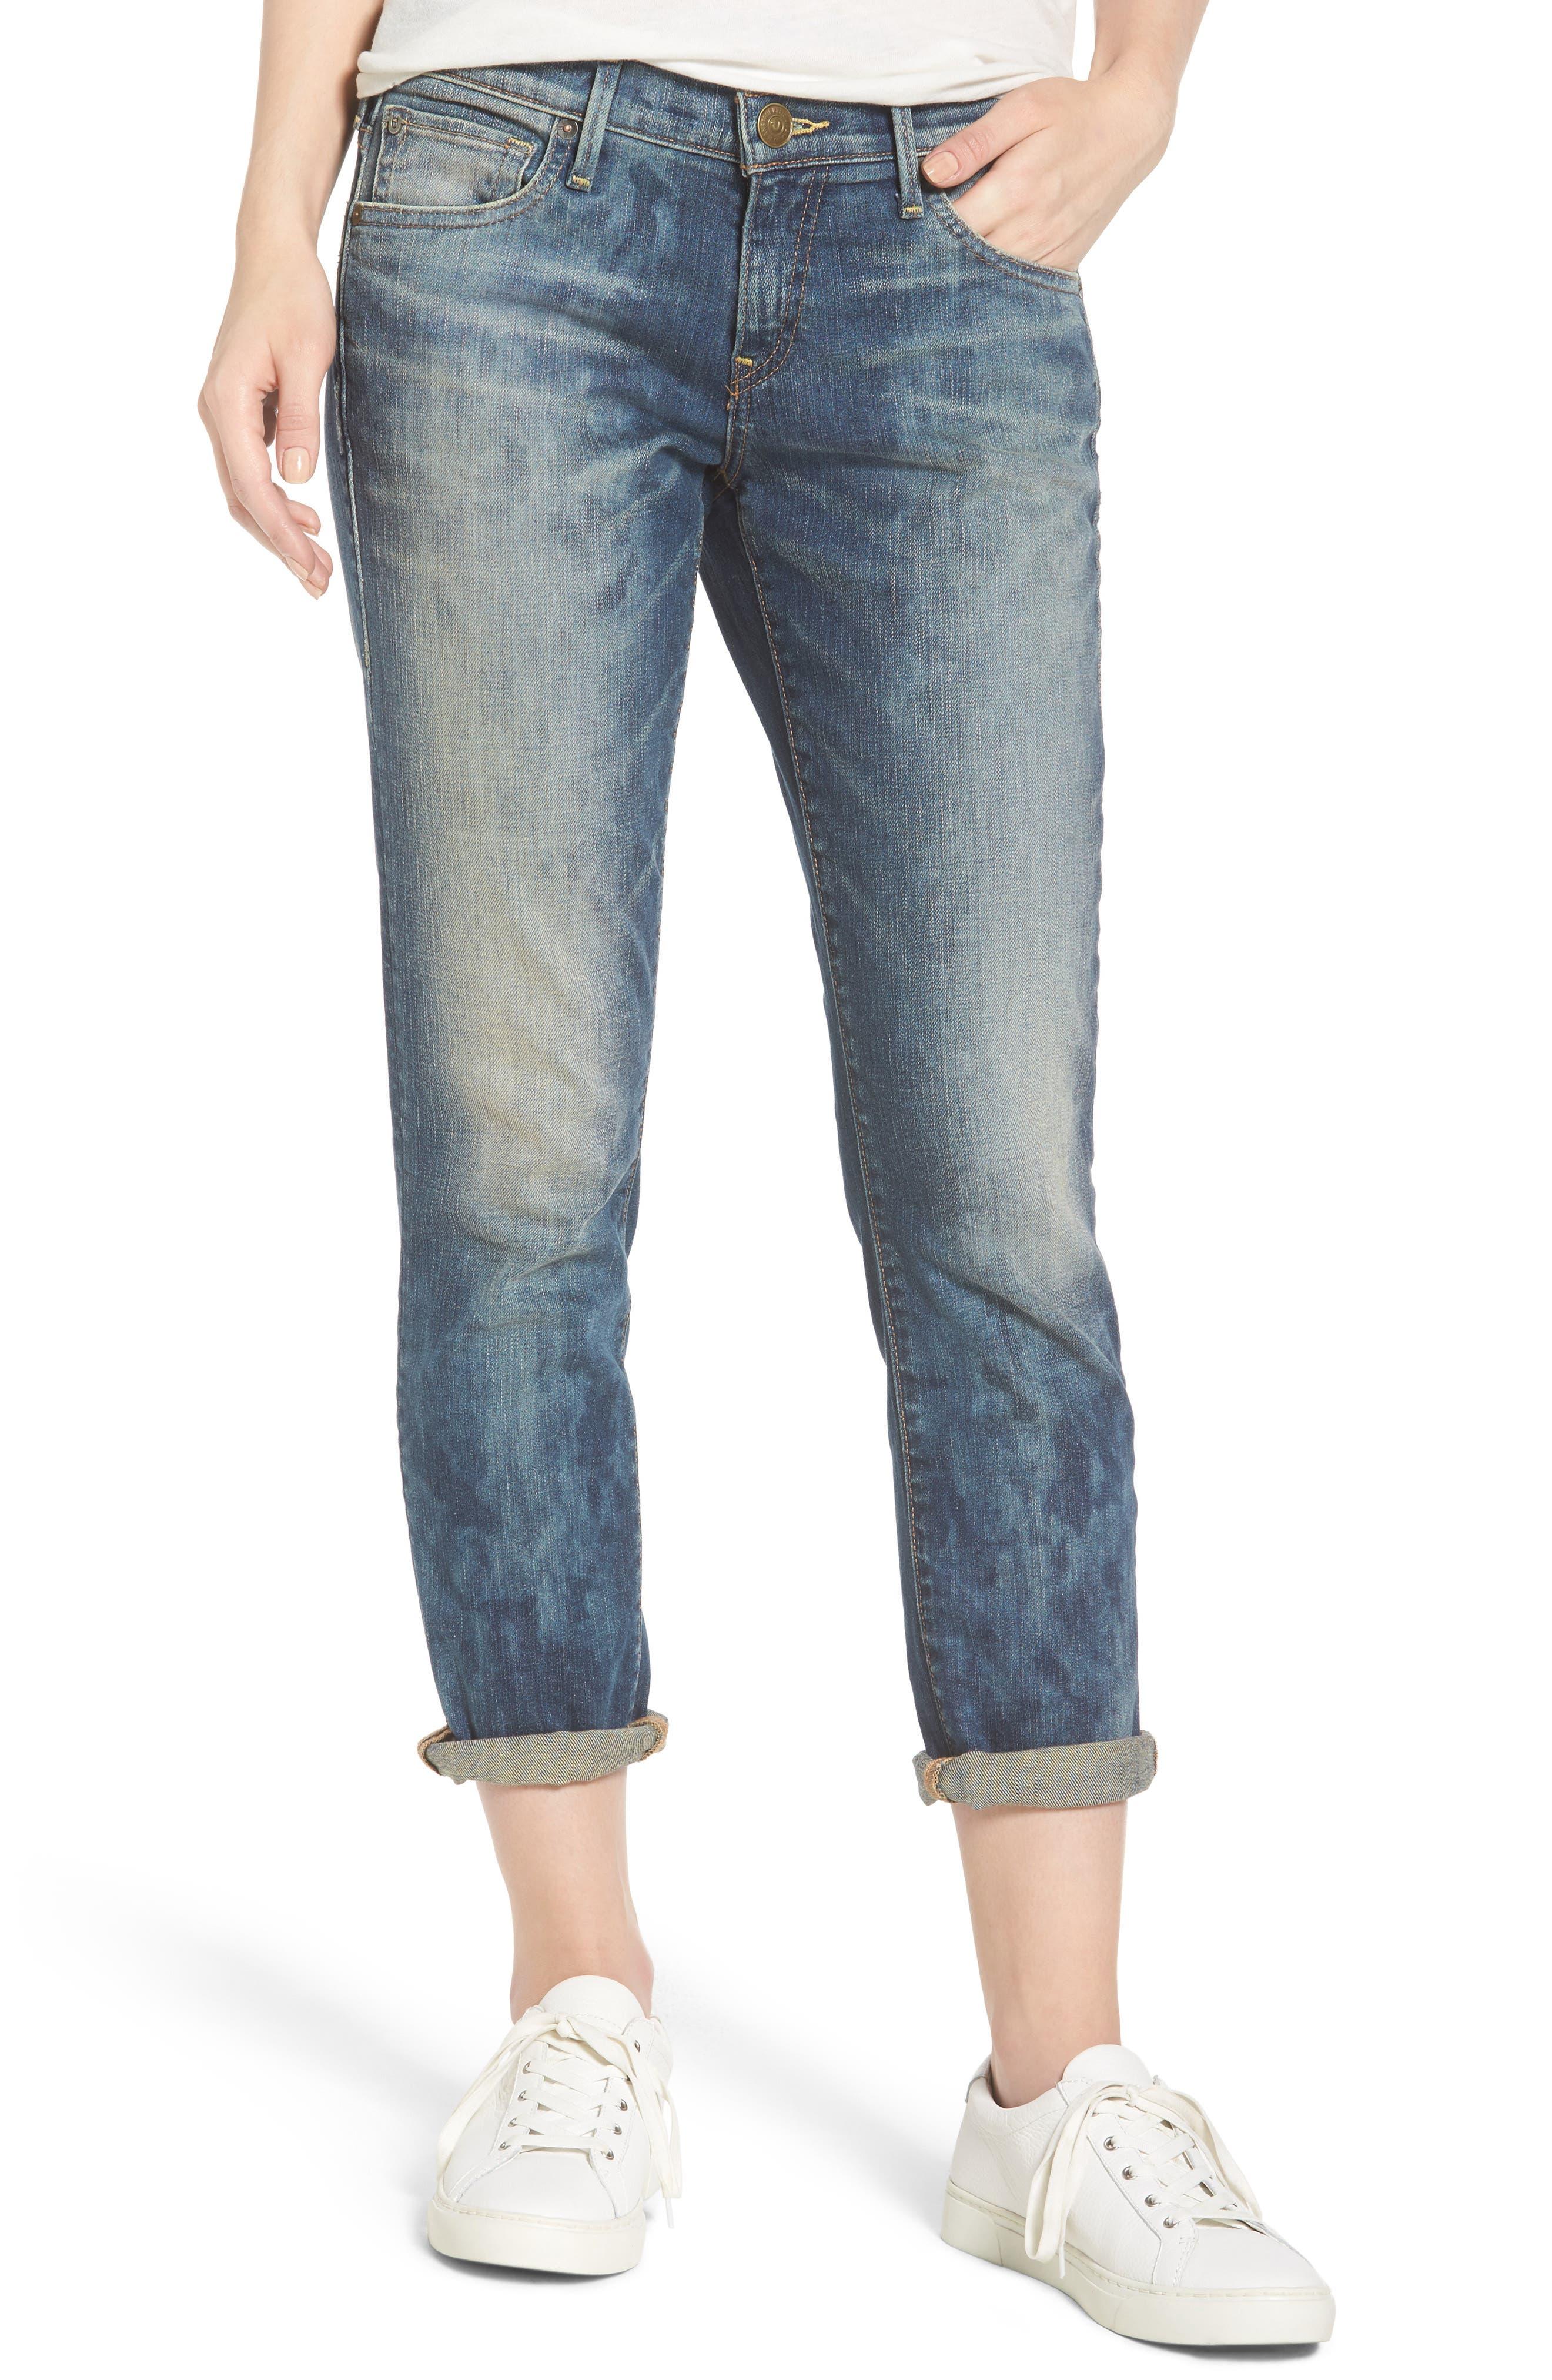 Alternate Image 1 Selected - True Religion Brand Jeans Cameron Slim Boyfriend Jeans (Distillery)